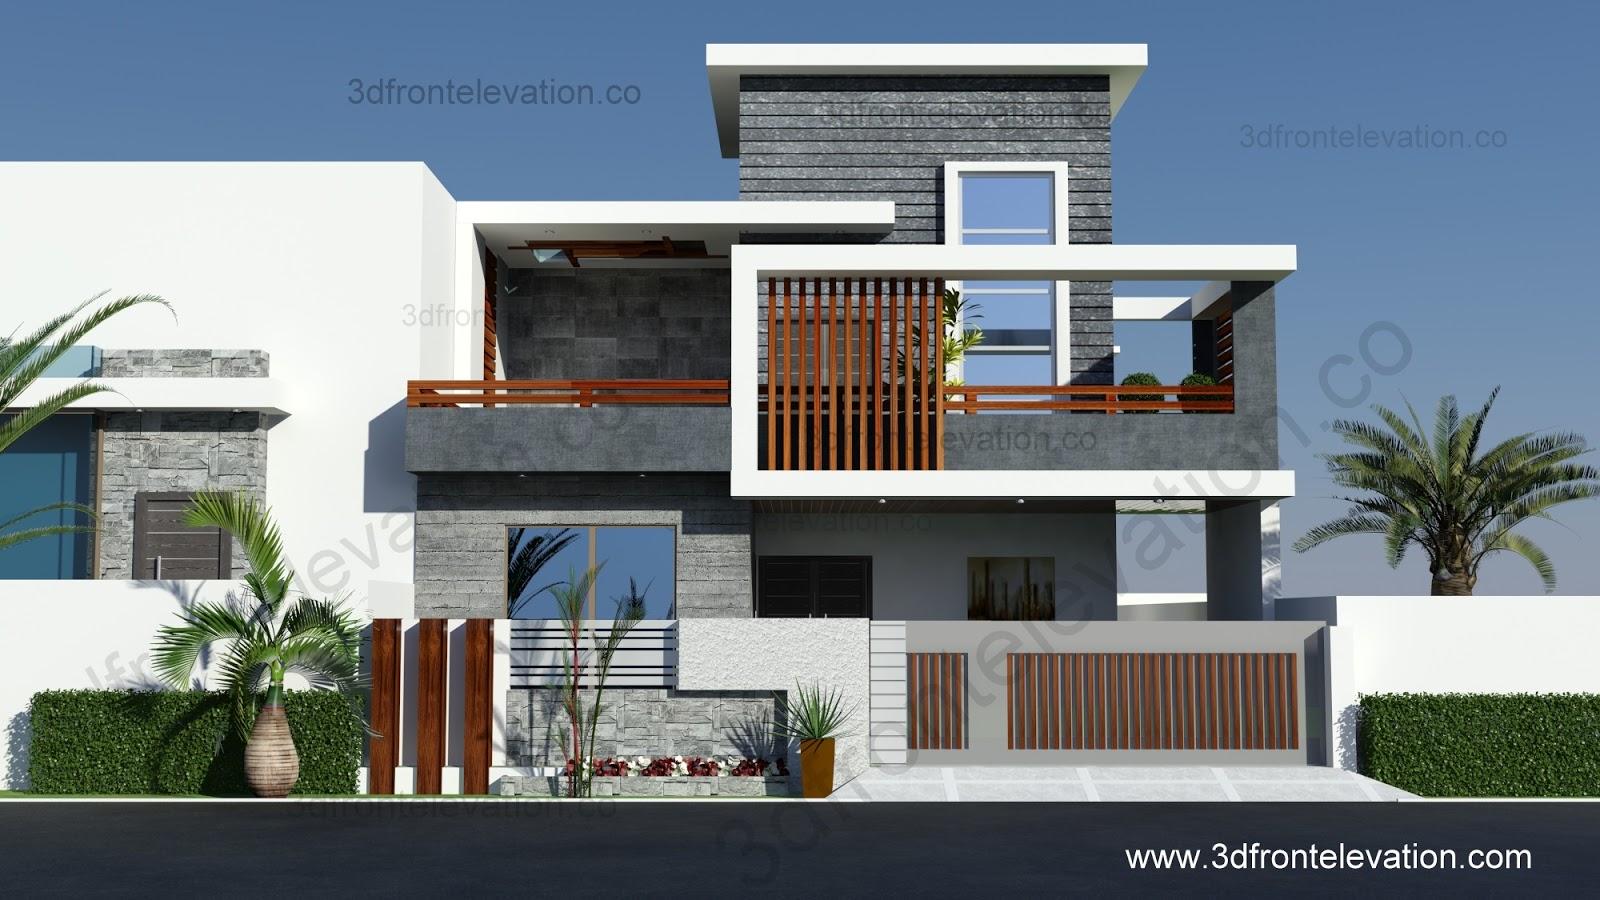 Best Kitchen Gallery: Portfolio 3d Front Elevation of 3d Image Of Front House Designs on rachelxblog.com